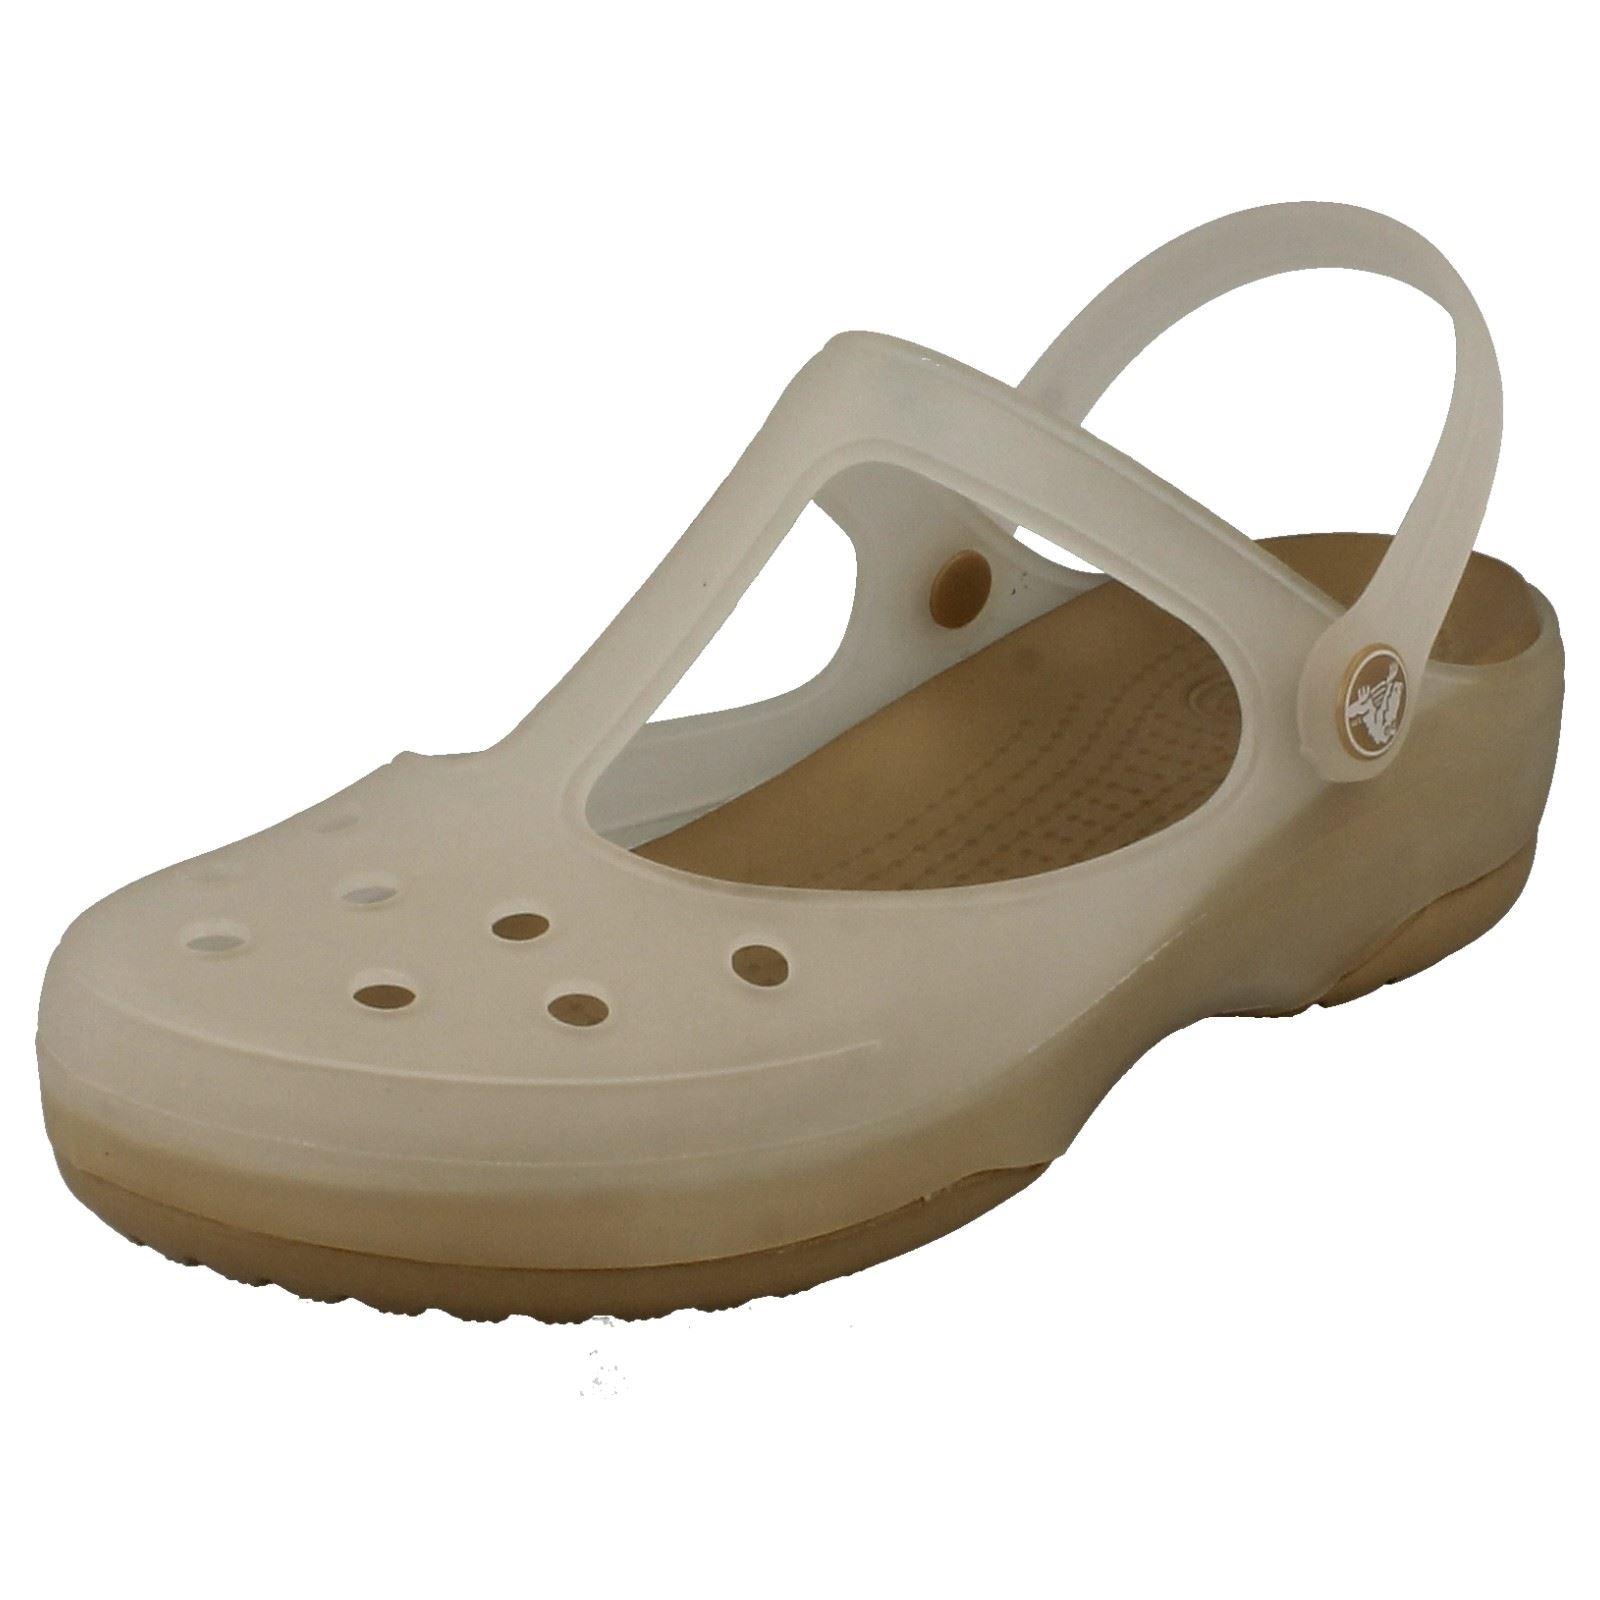 Ladies Crocs Slip On Sandals Carlie Mary Jane | eBay - photo#49